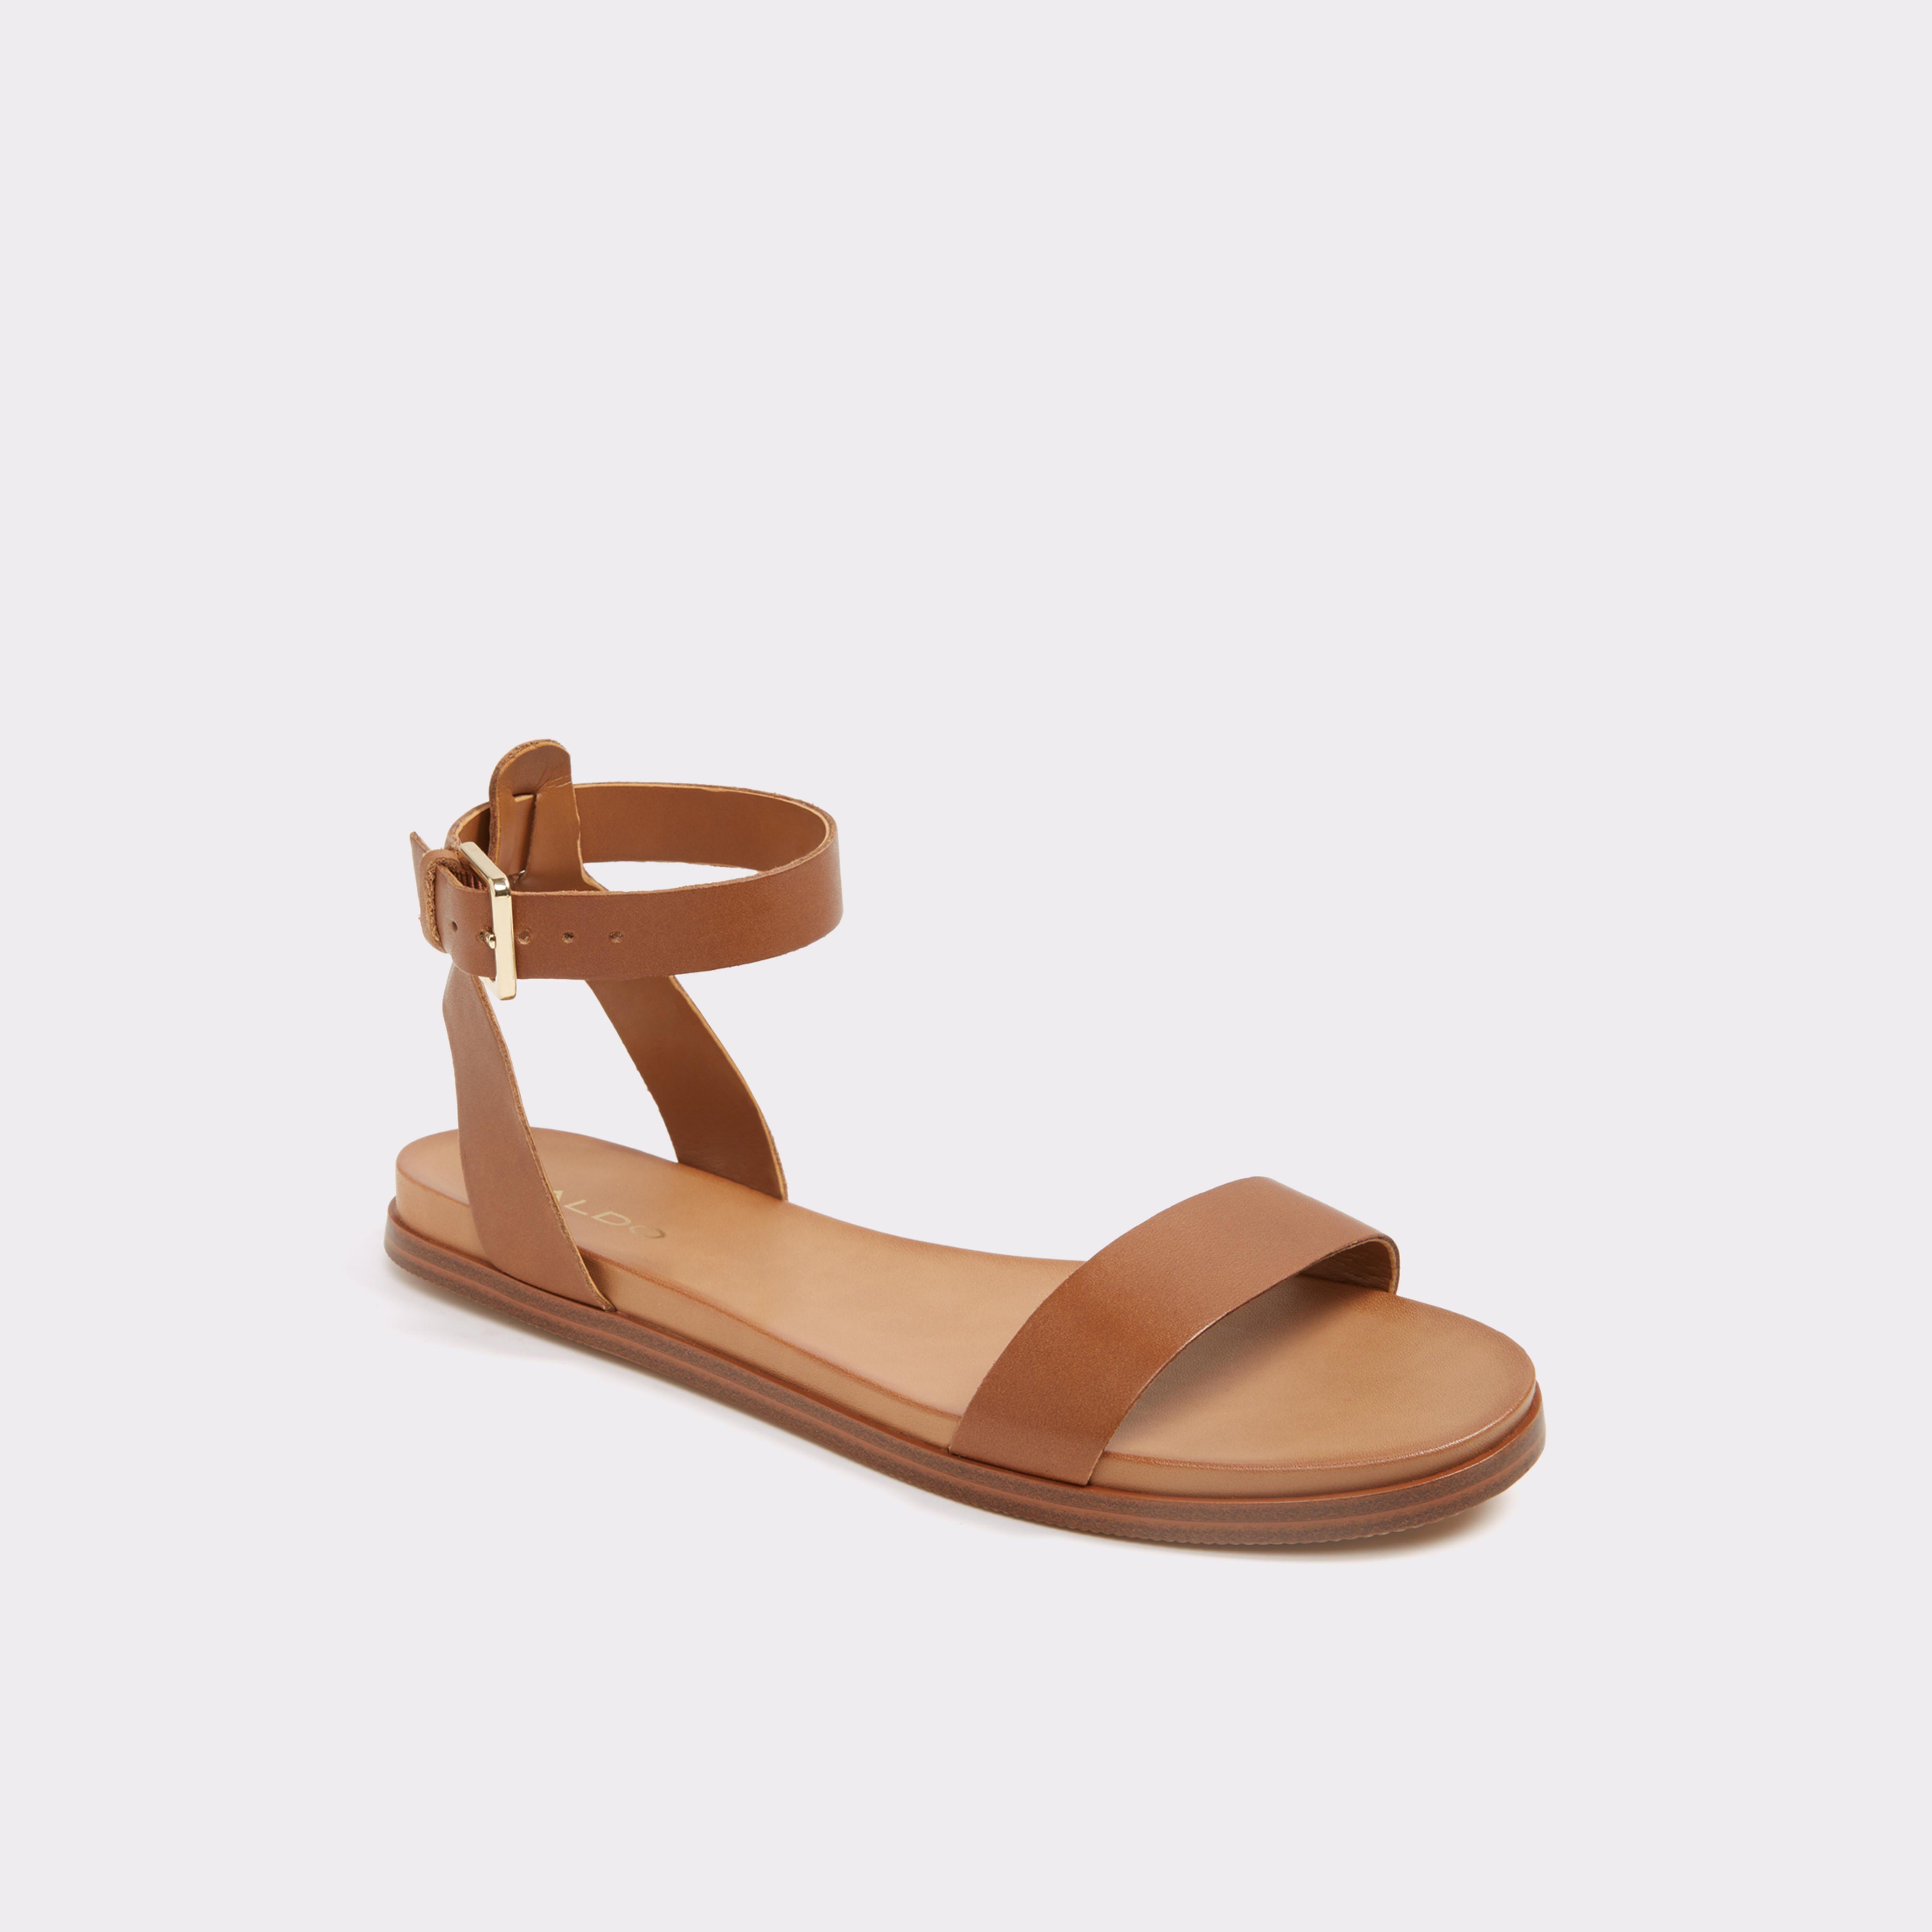 b8c23464ed9 Gwenna Medium Brown Women s Flats